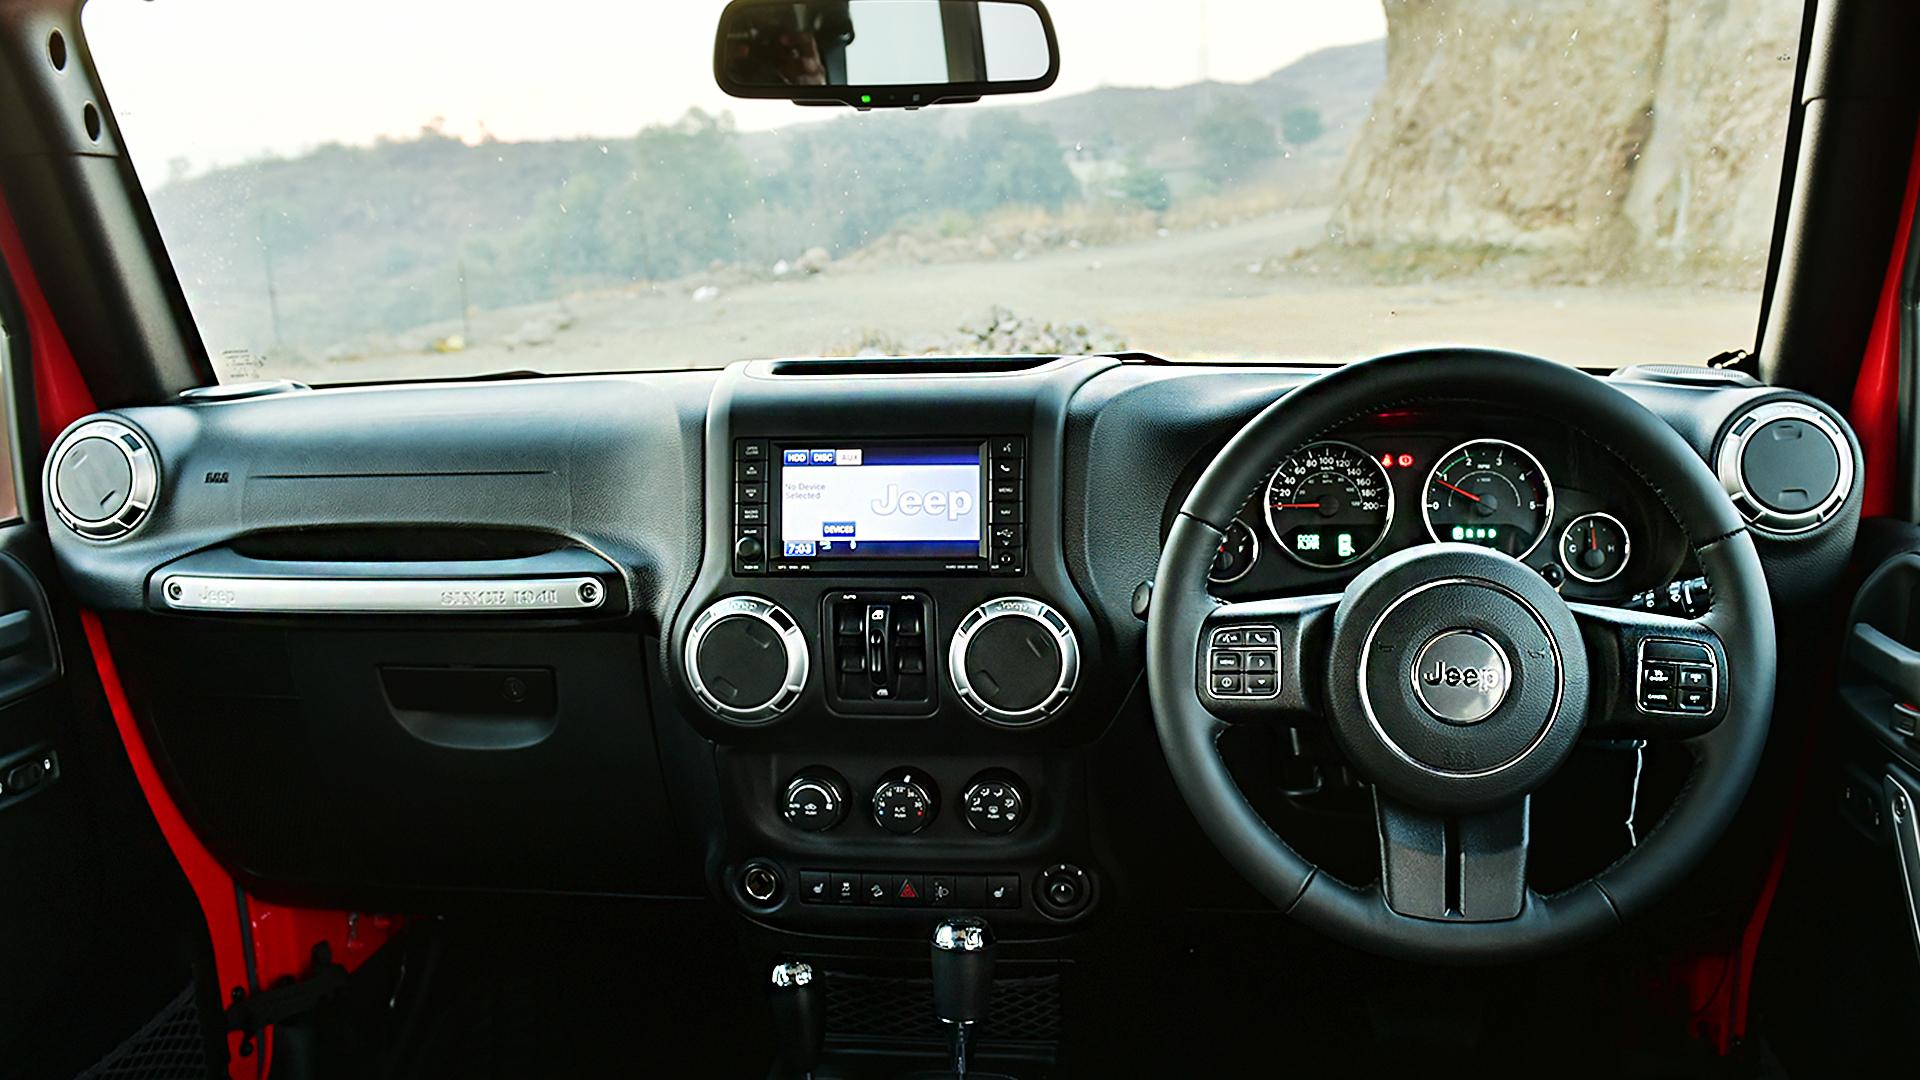 Jeep Wrangler 2016 Unlimited Interior